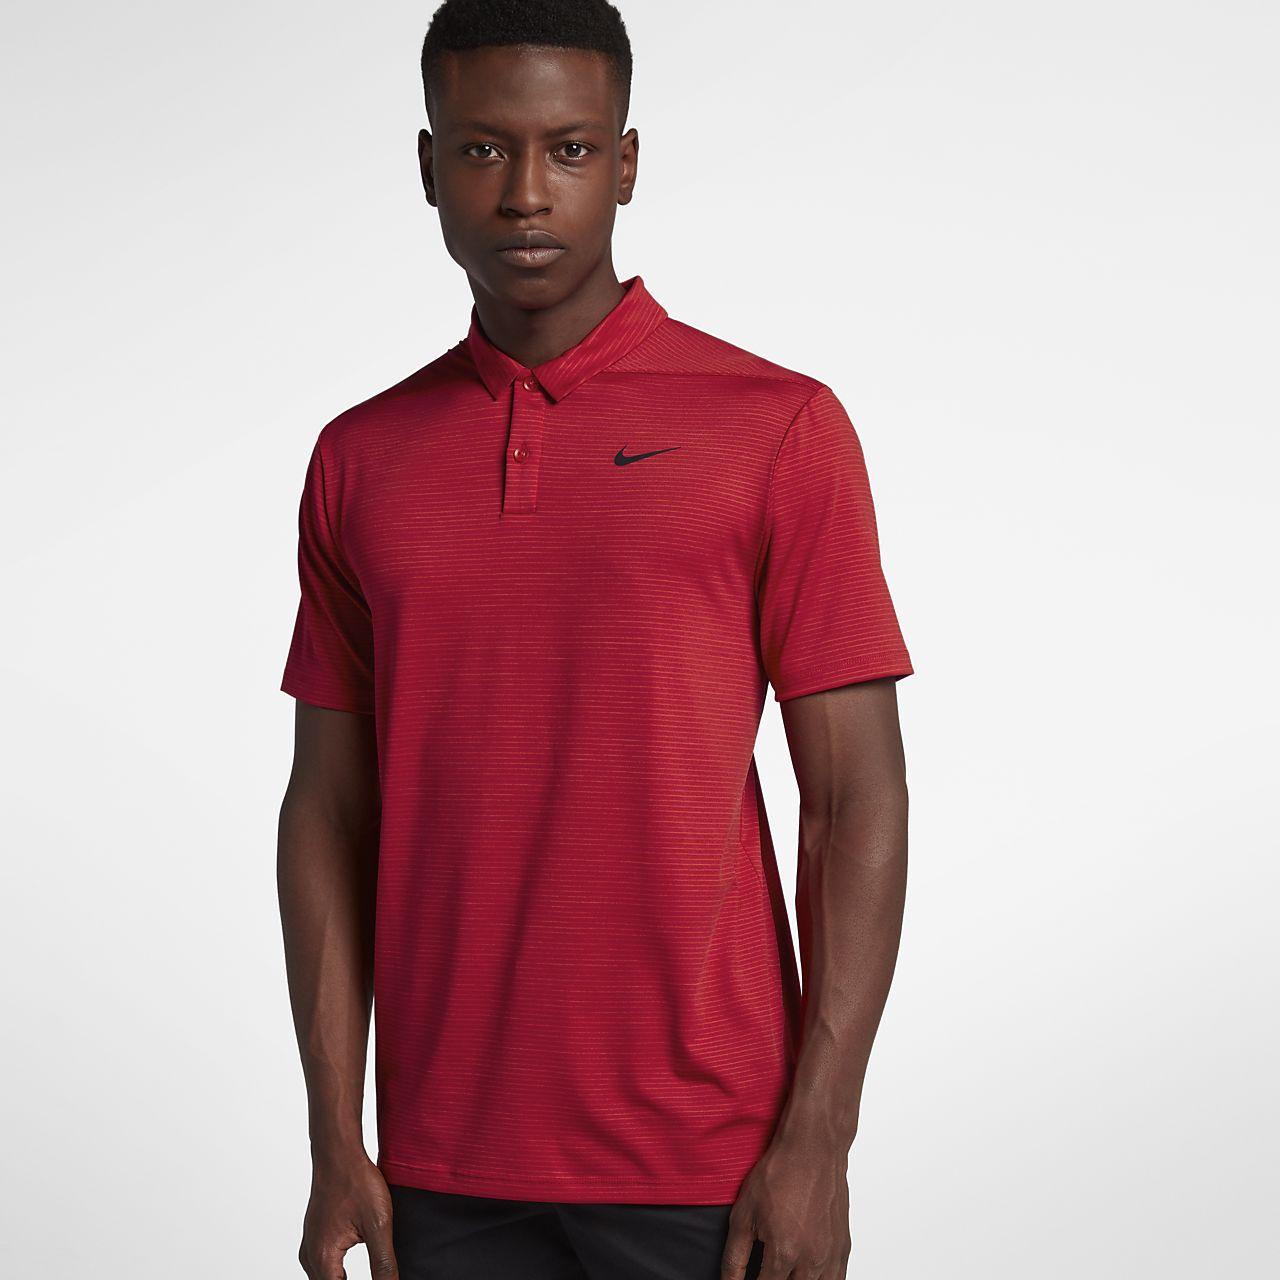 7dd8d4eb Nike Dri-FIT TW Men's Striped Golf Polo. Nike.com